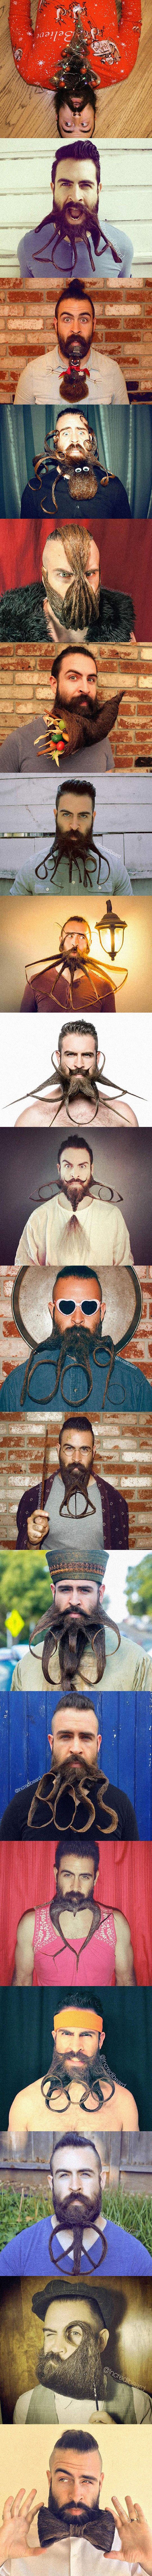 long-bearded-man-decorations